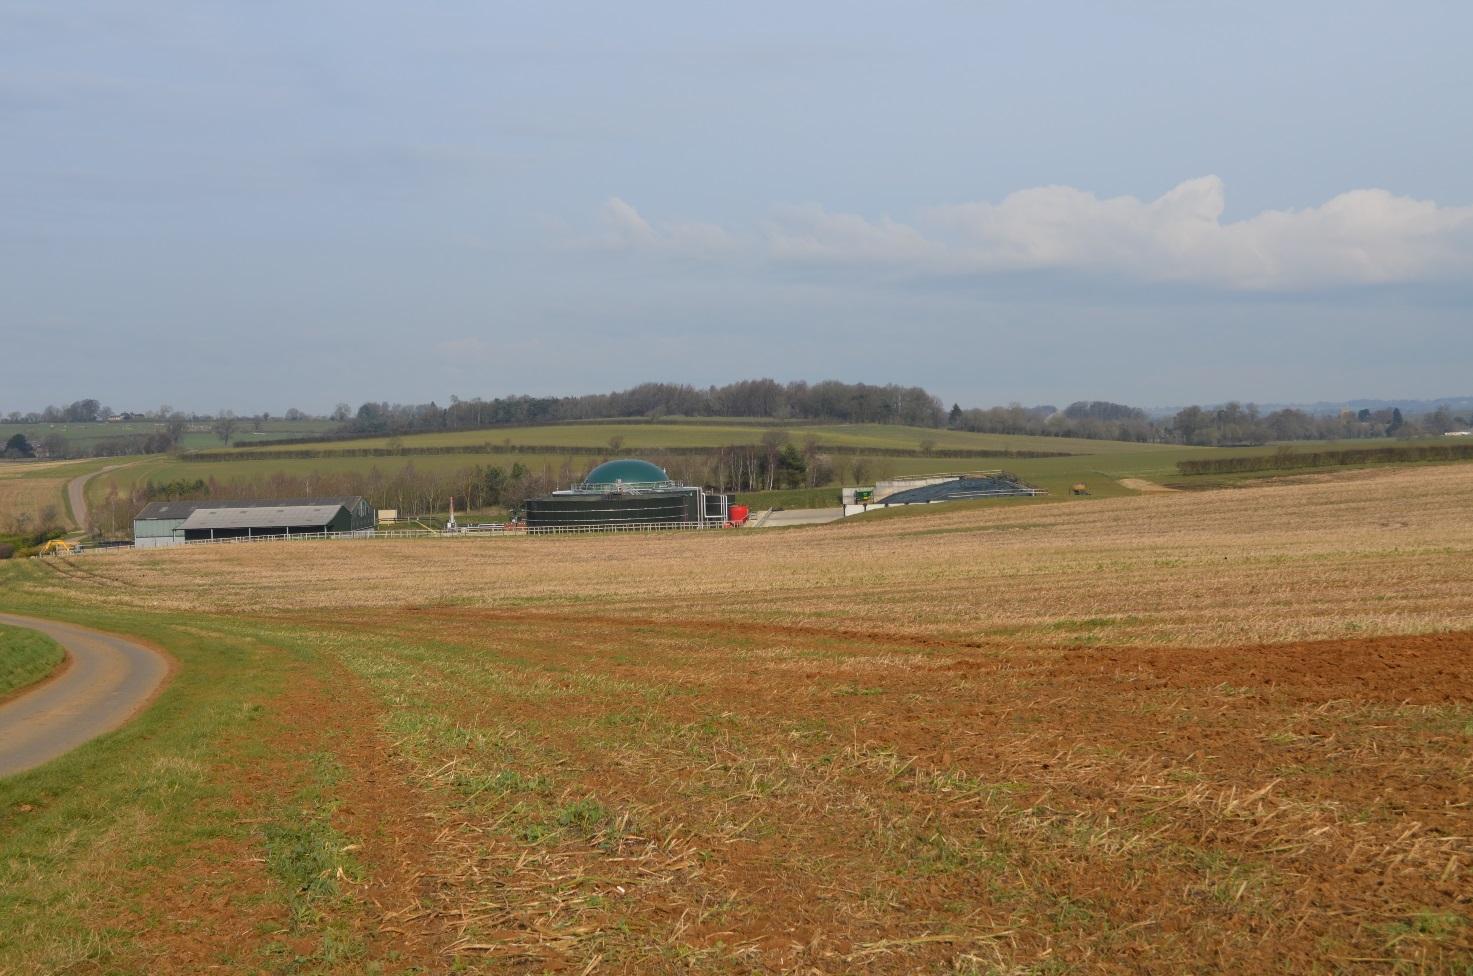 MEMBER'S PRESS RELEASE: Aardvark Appointed As Certification Body To Compost & Biofertiliser Schemes